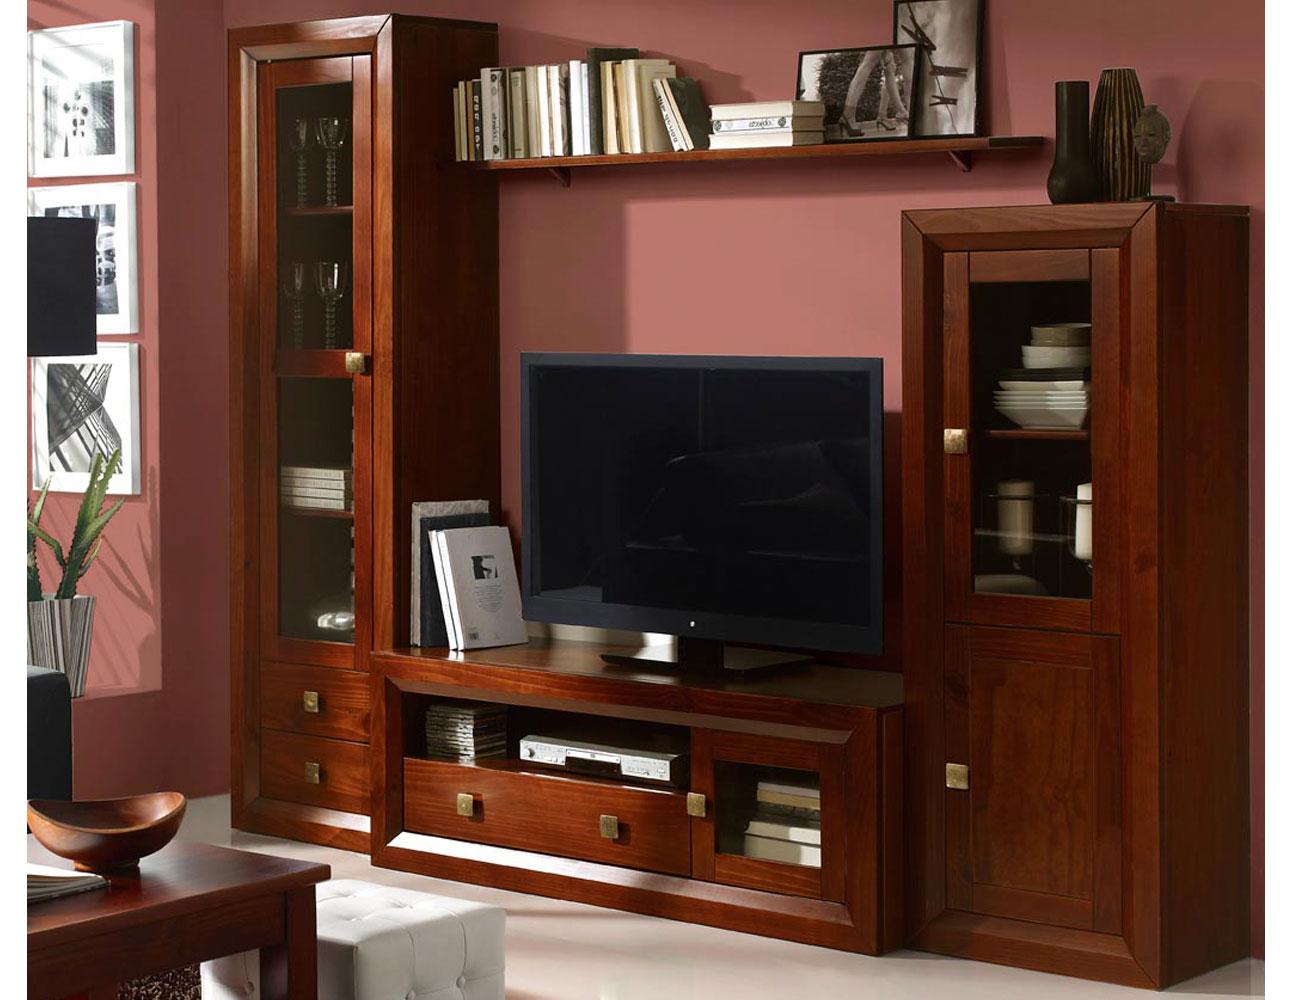 Muebles salon comedor nogal madera dm vitrina bodeguero tv2